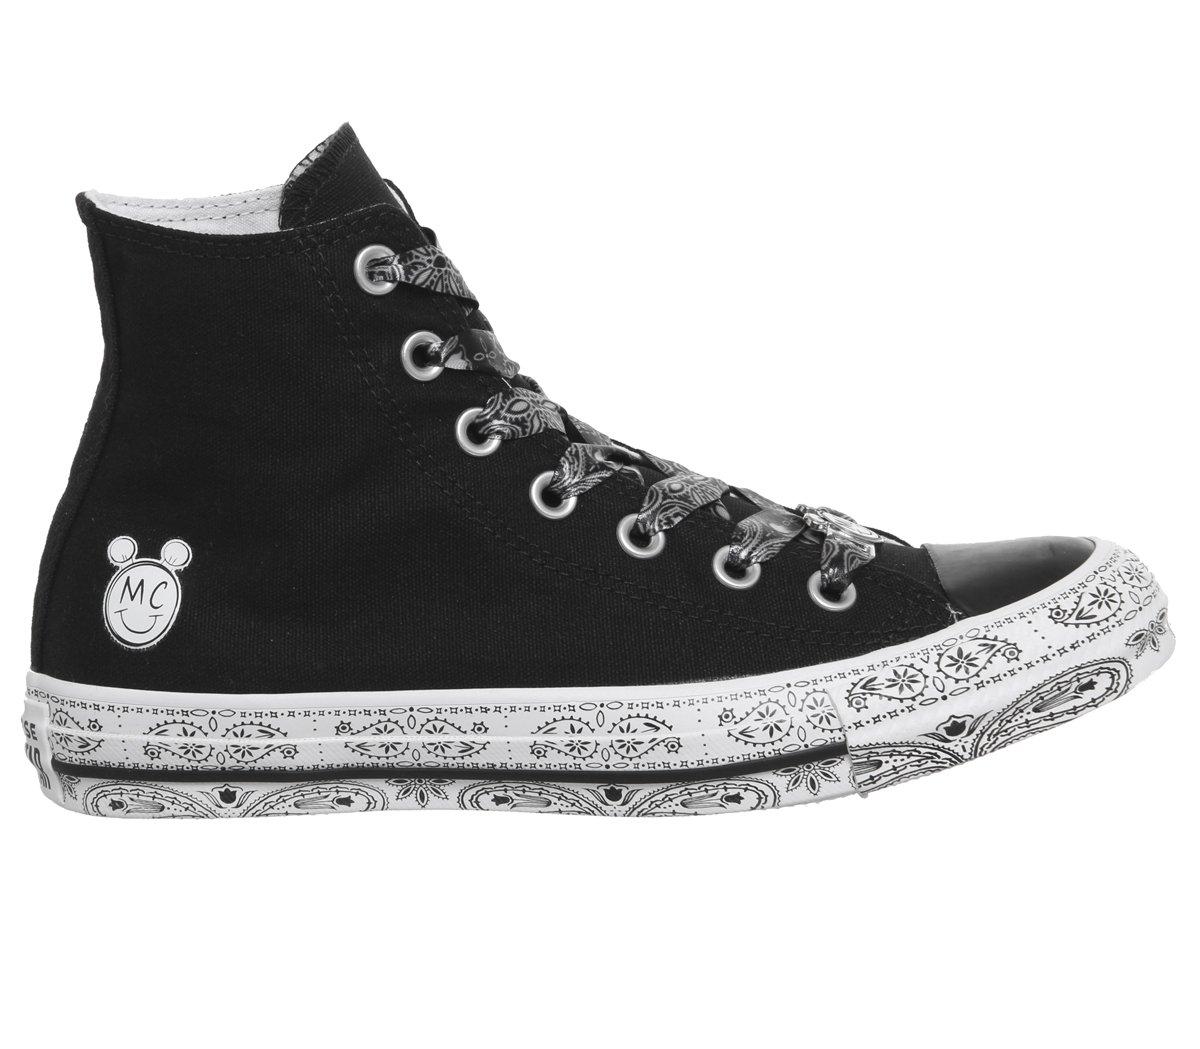 780bb9fe125b4 Converse Womens x Miley Cyrus Chuck Taylor All Star Lo Sneaker (Mens  3/Womens 5, Black White Black 9575)